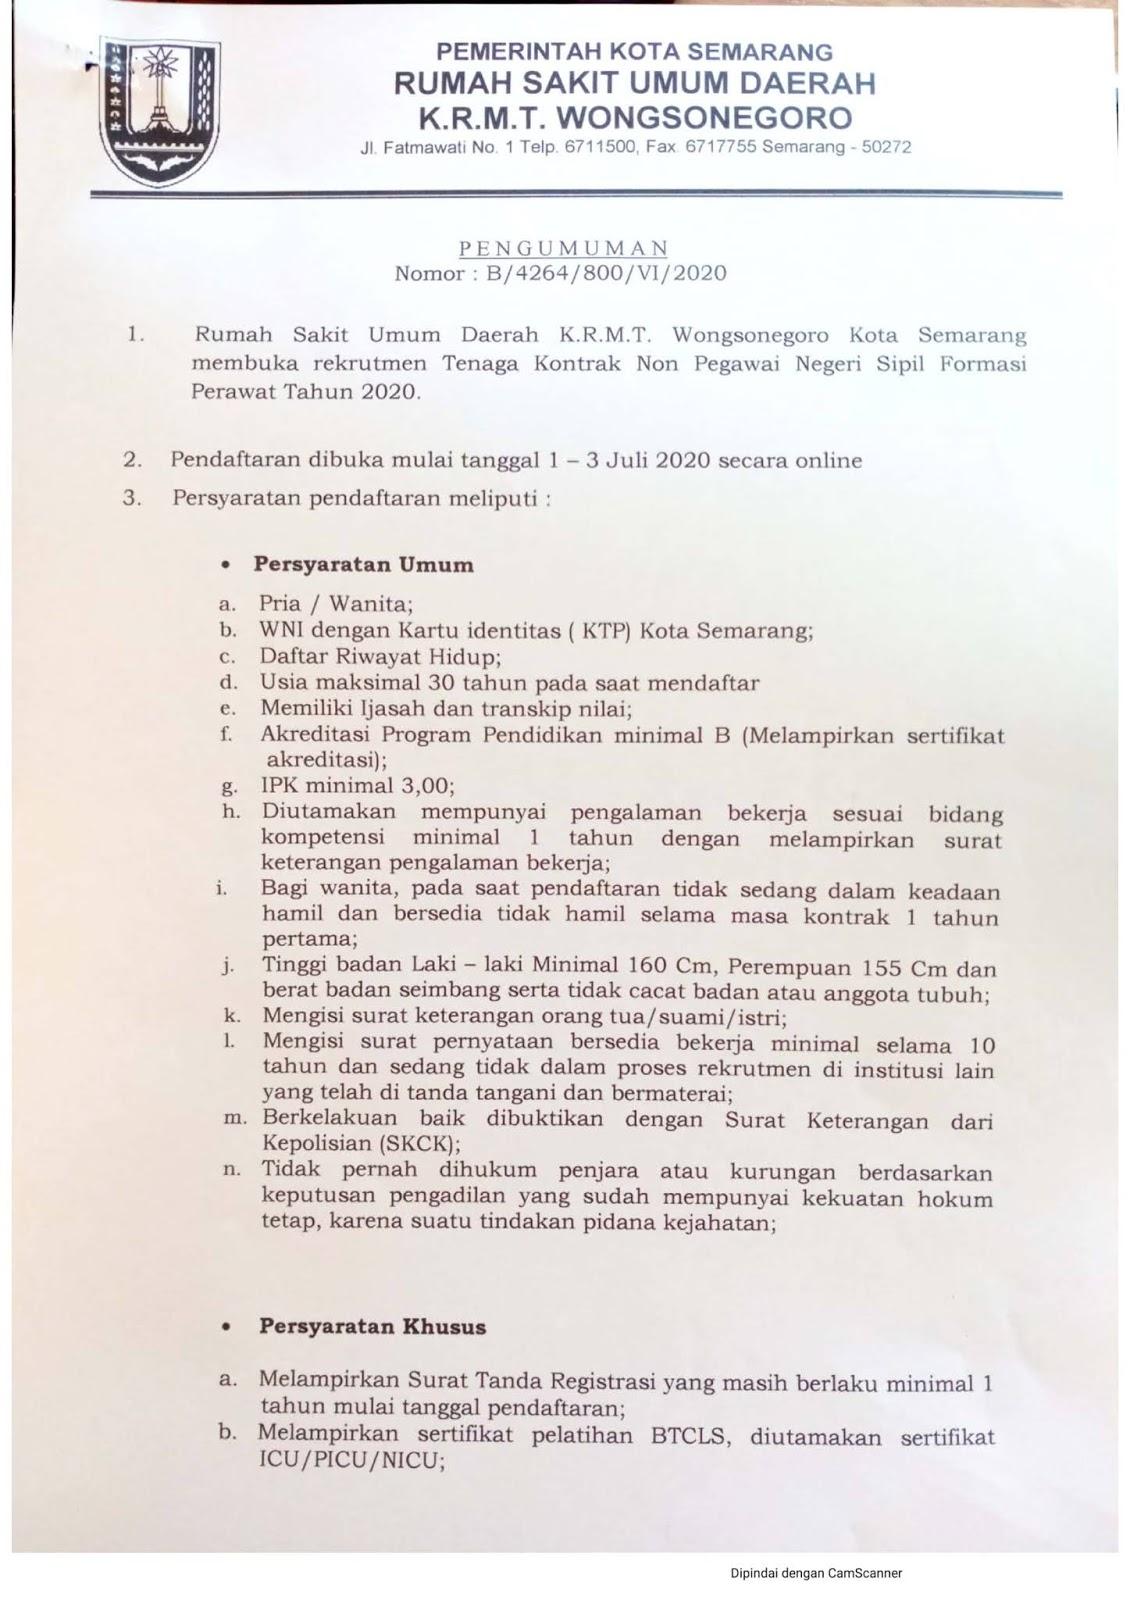 Lowongan Non PNS Rumah Sakit Umum Daerah RSUD K.R.M.T. Wongsonegoro Juli 2020